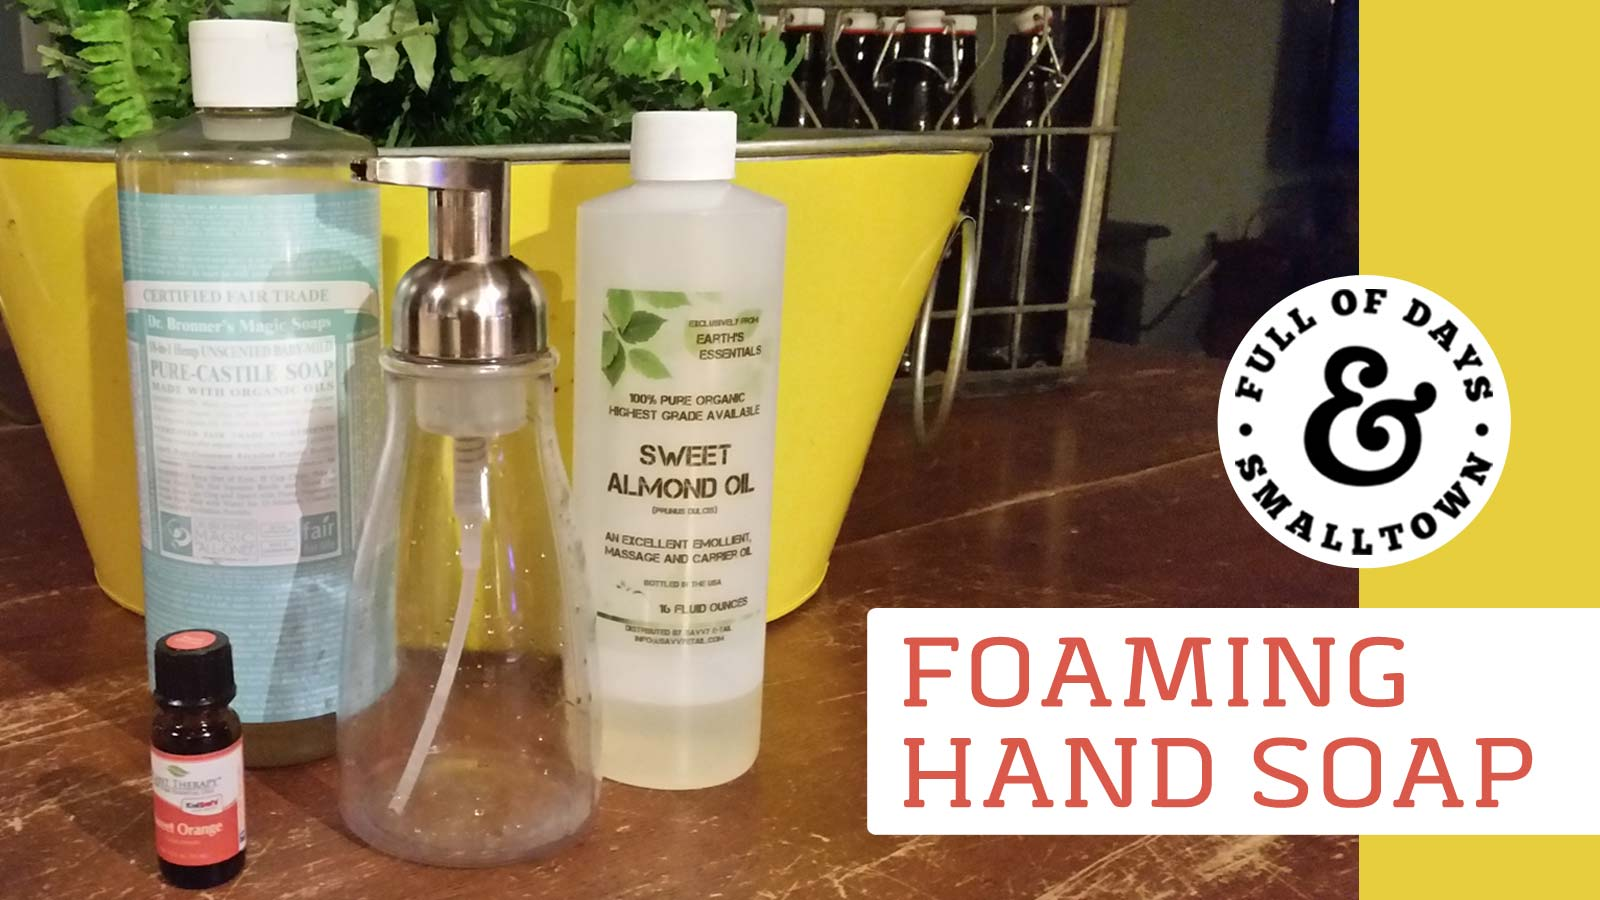 DIY-Foaming-Hand-Soap_Full-of-Days_1600-x-900